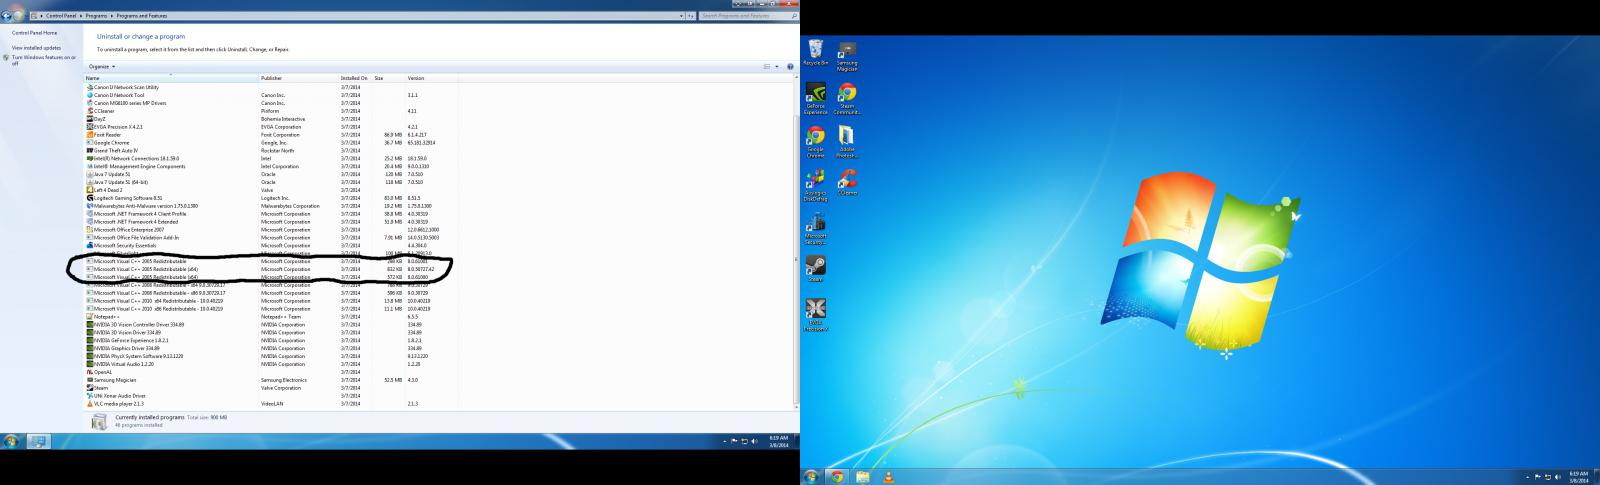 Click image for larger version  Name:C++ Errpr.jpg Views:50 Size:71.5 KB ID:163457